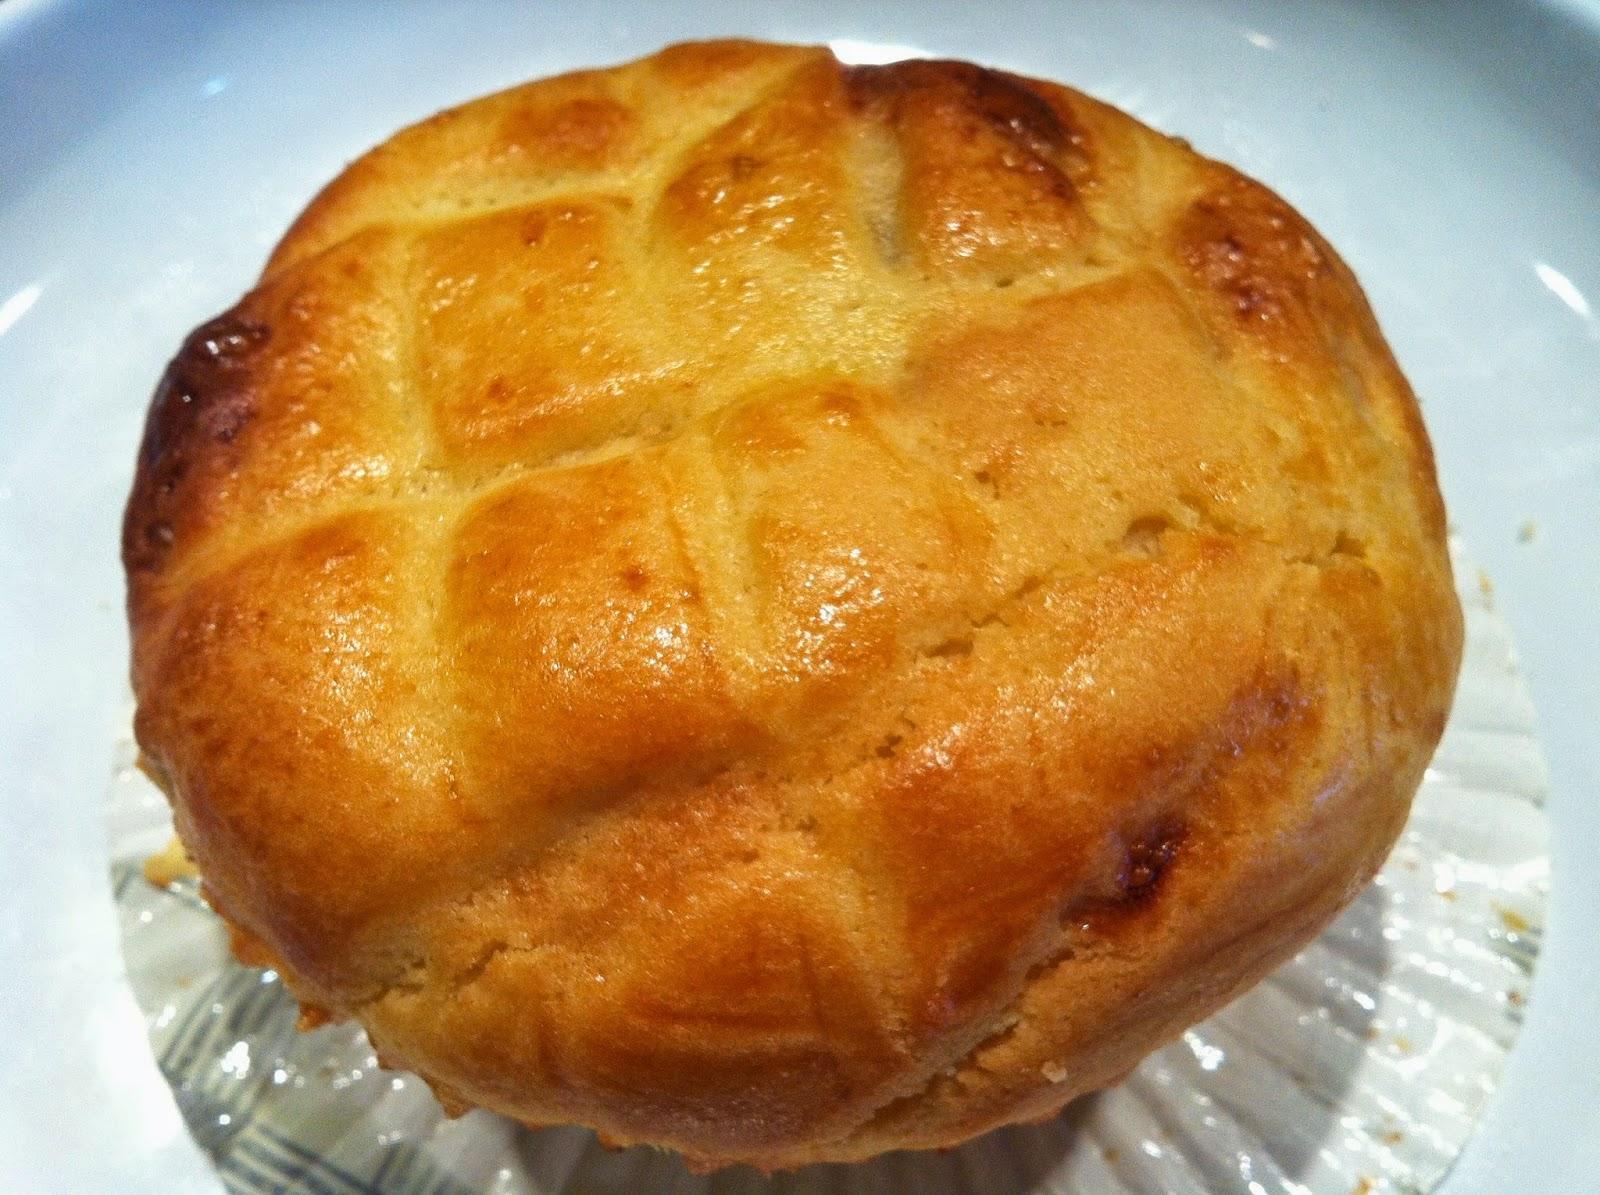 Baking Taitai: Pineapple buns, Bo Luo Bao, 菠萝包